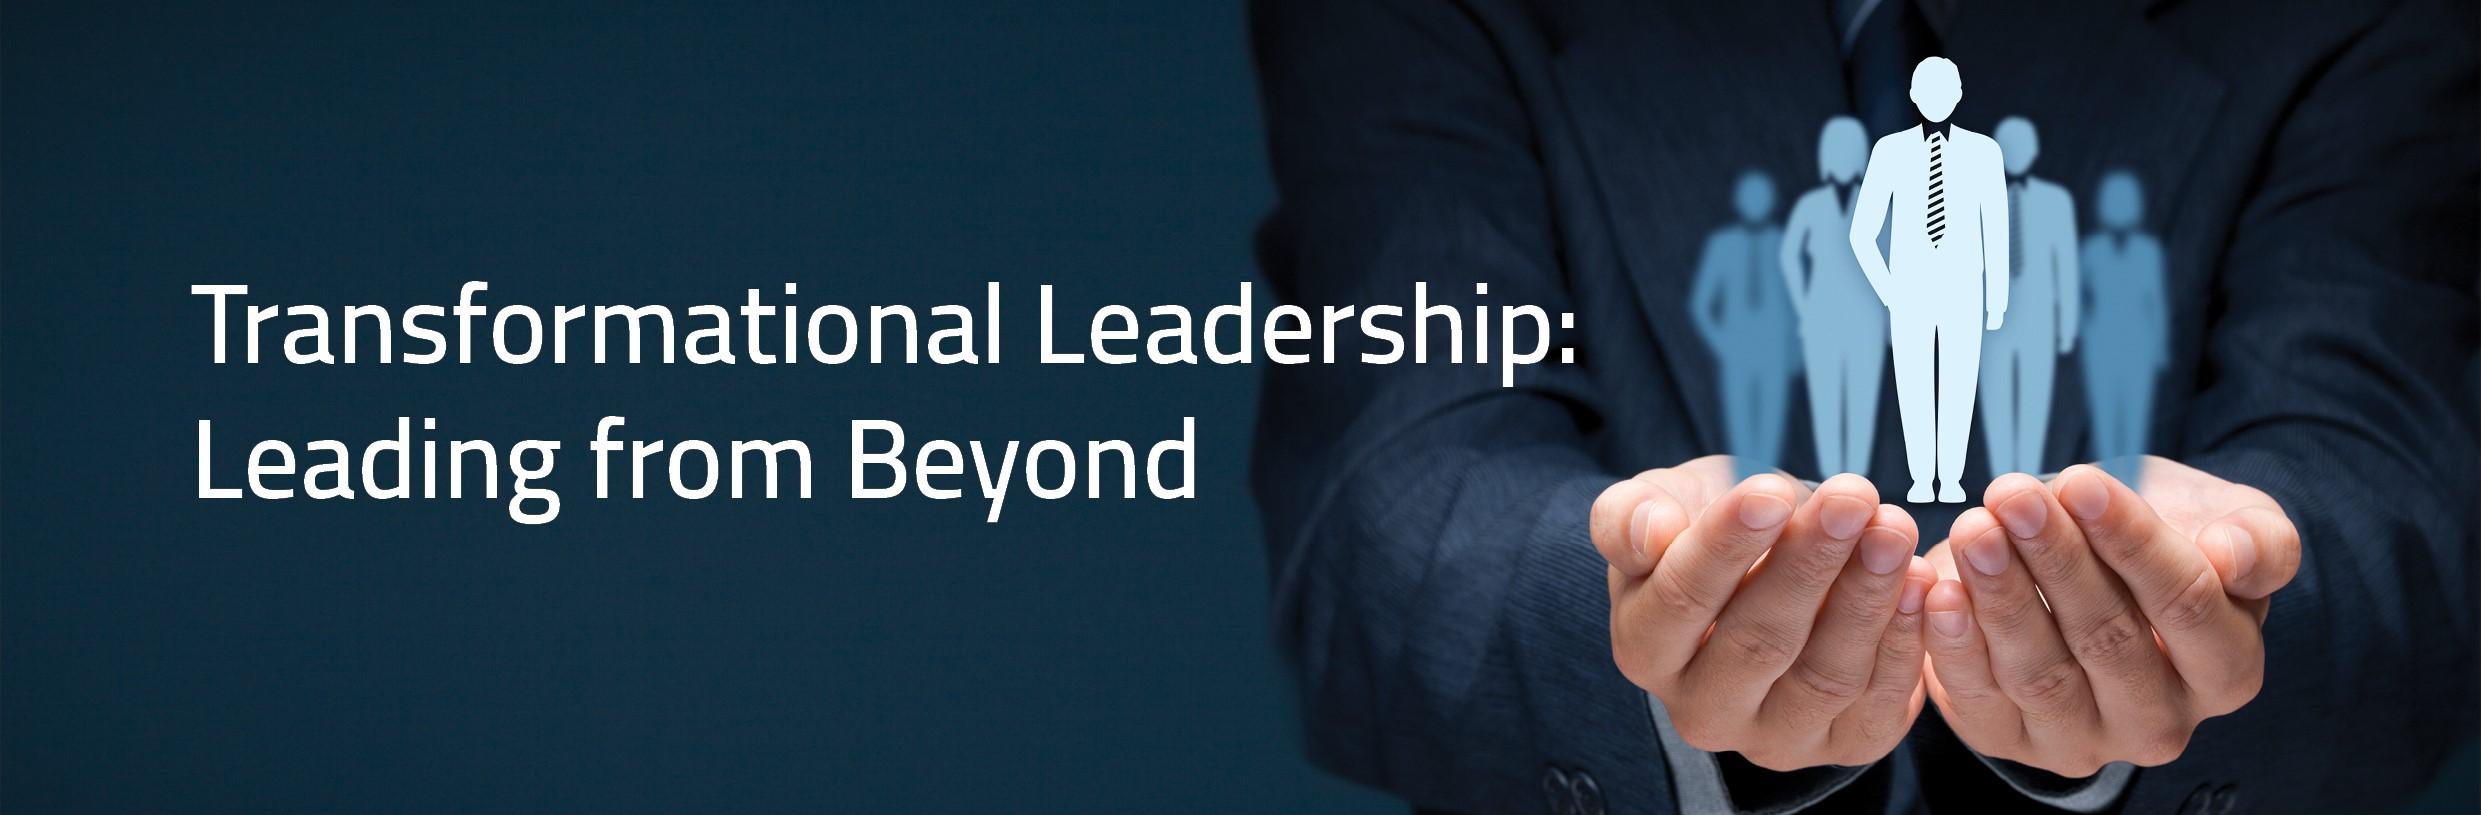 Transformational Leadership Leading From Beyond Banner Beckett Mcinroy